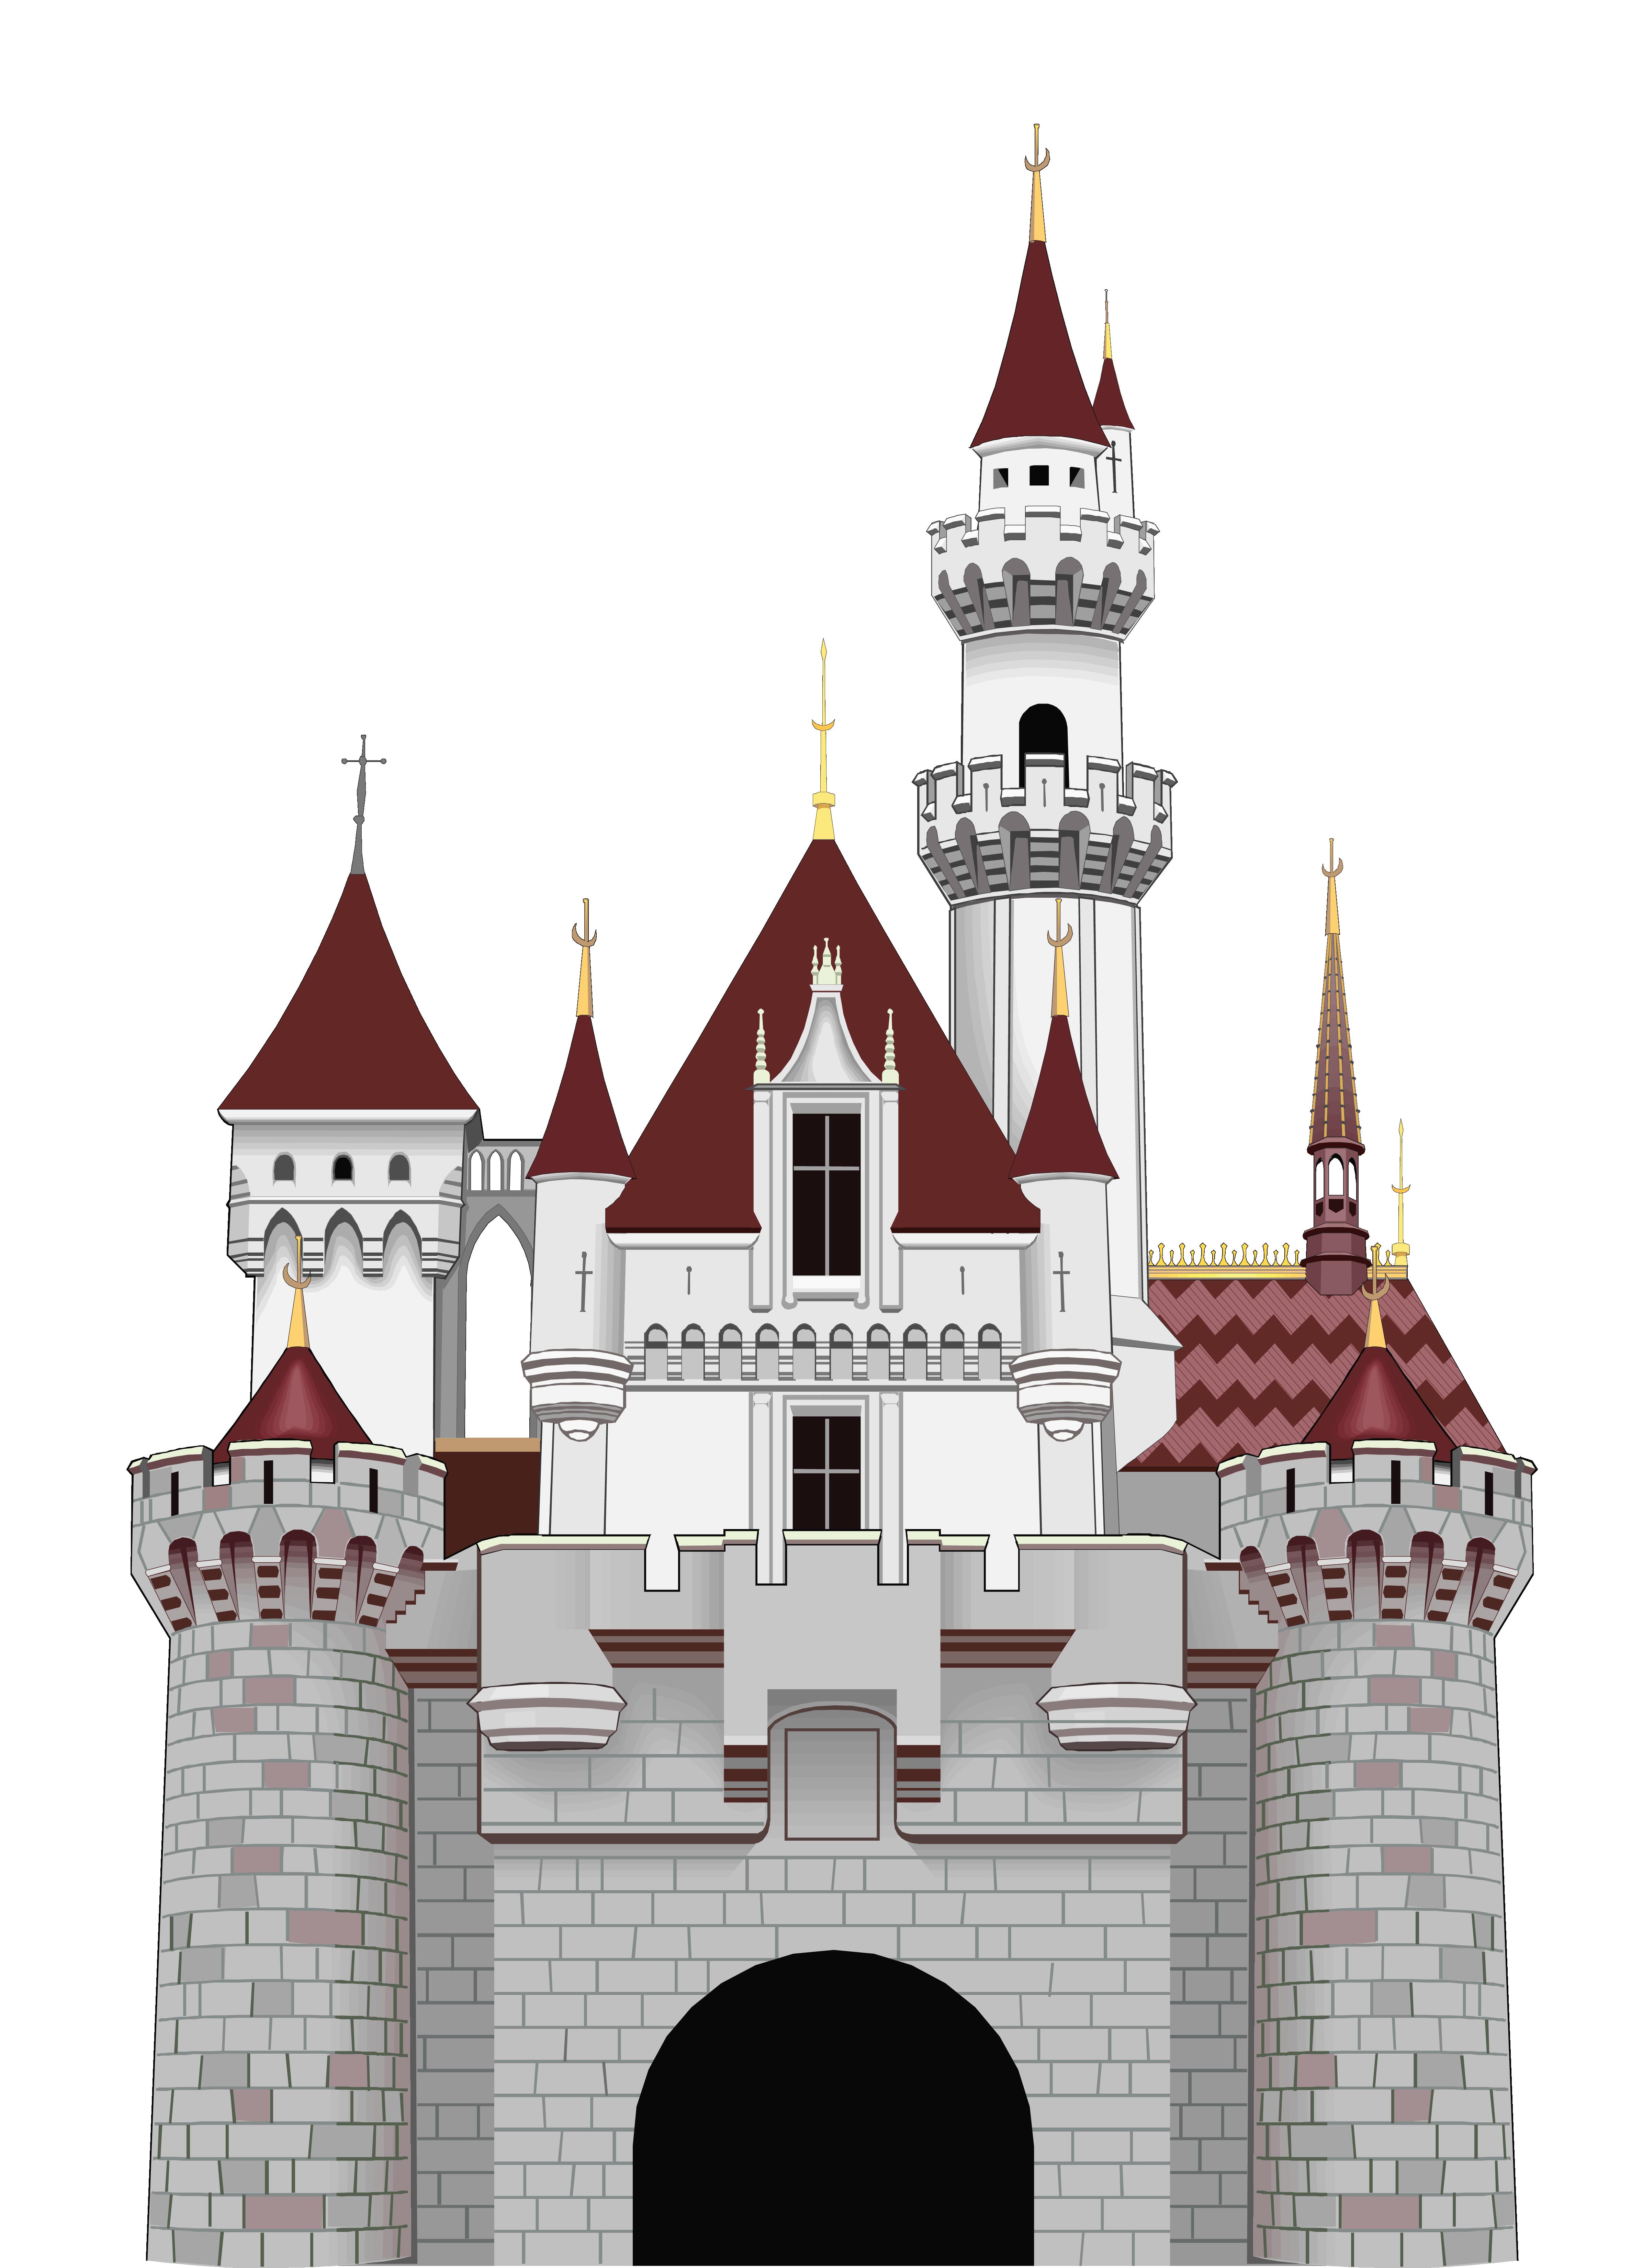 Castile clipart Transparent pictures on F.